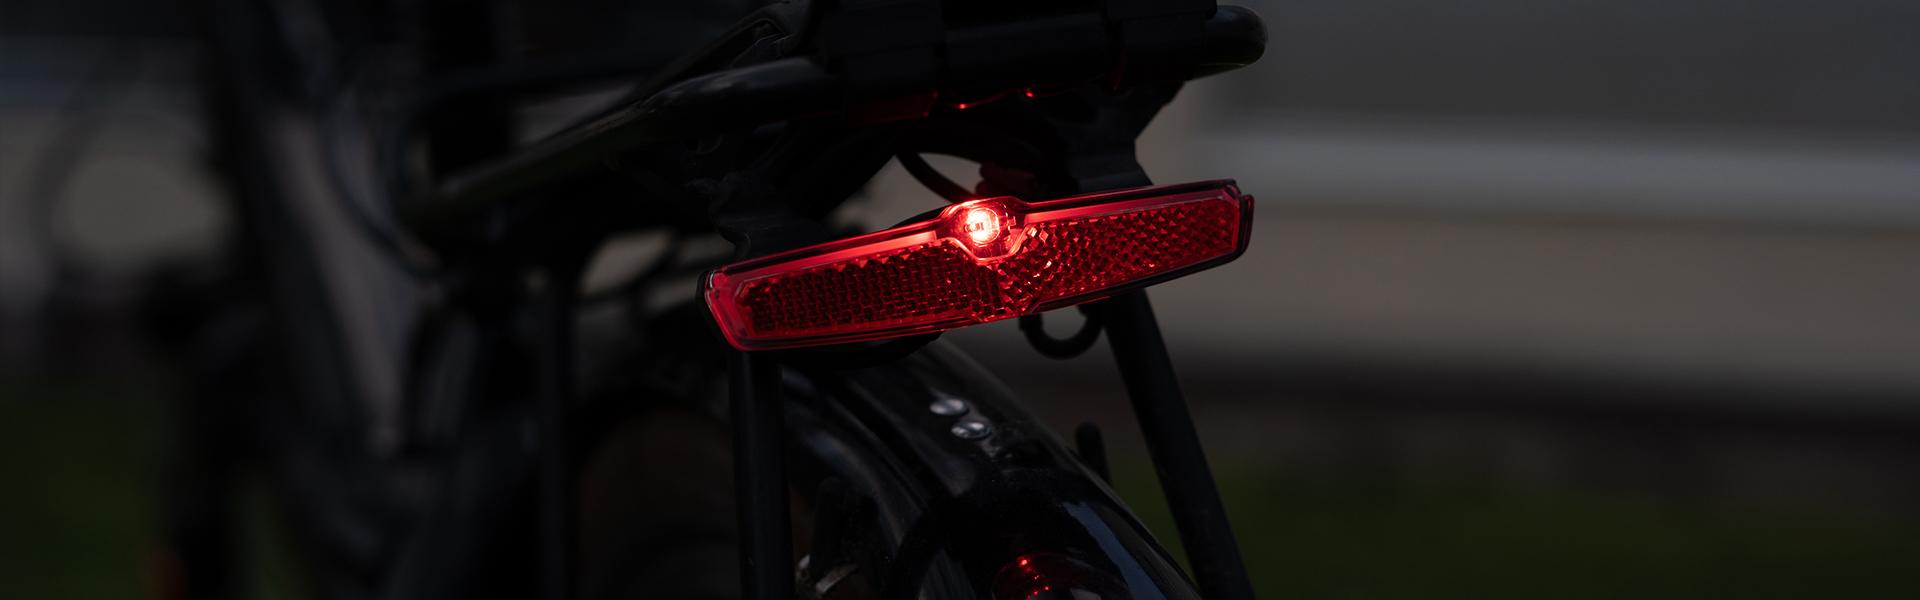 Sate-lite CREE 40lux ebike light ISO 6721-1 StVZO ECE  eletric bike headlight with StVZO ECE reflector front fork 6-48V